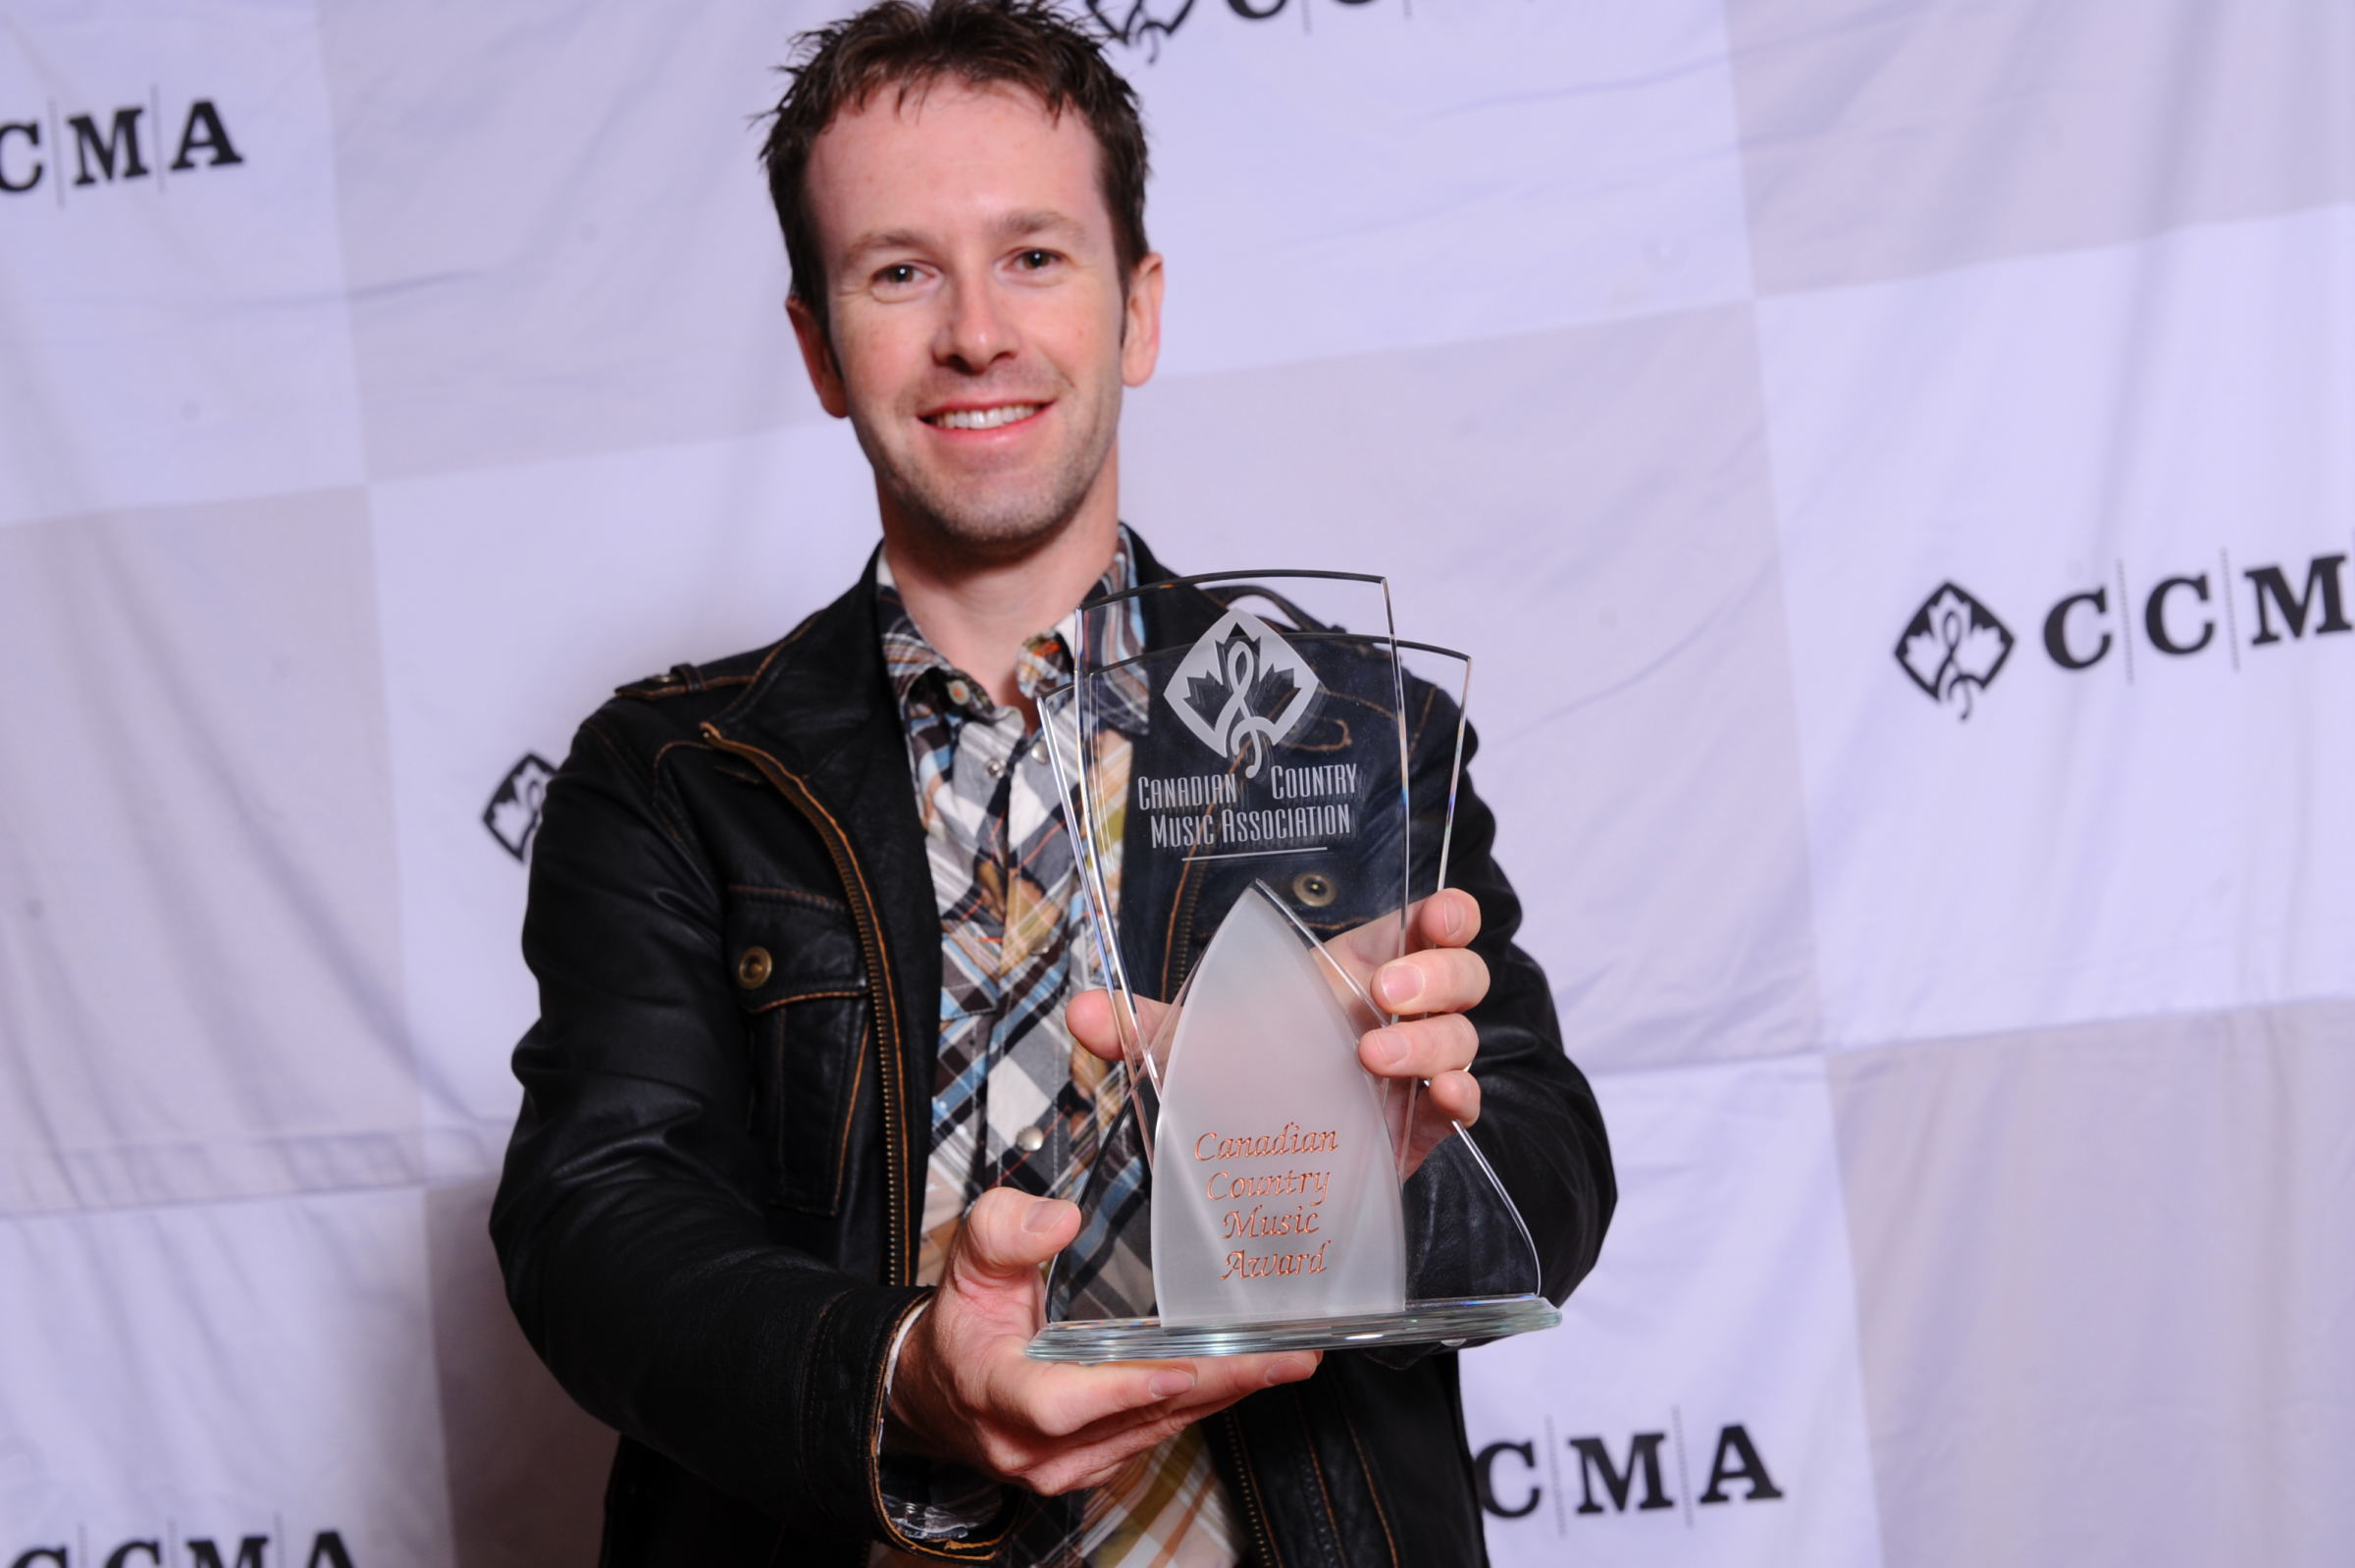 Studio Award @CCMA 2009.JPG